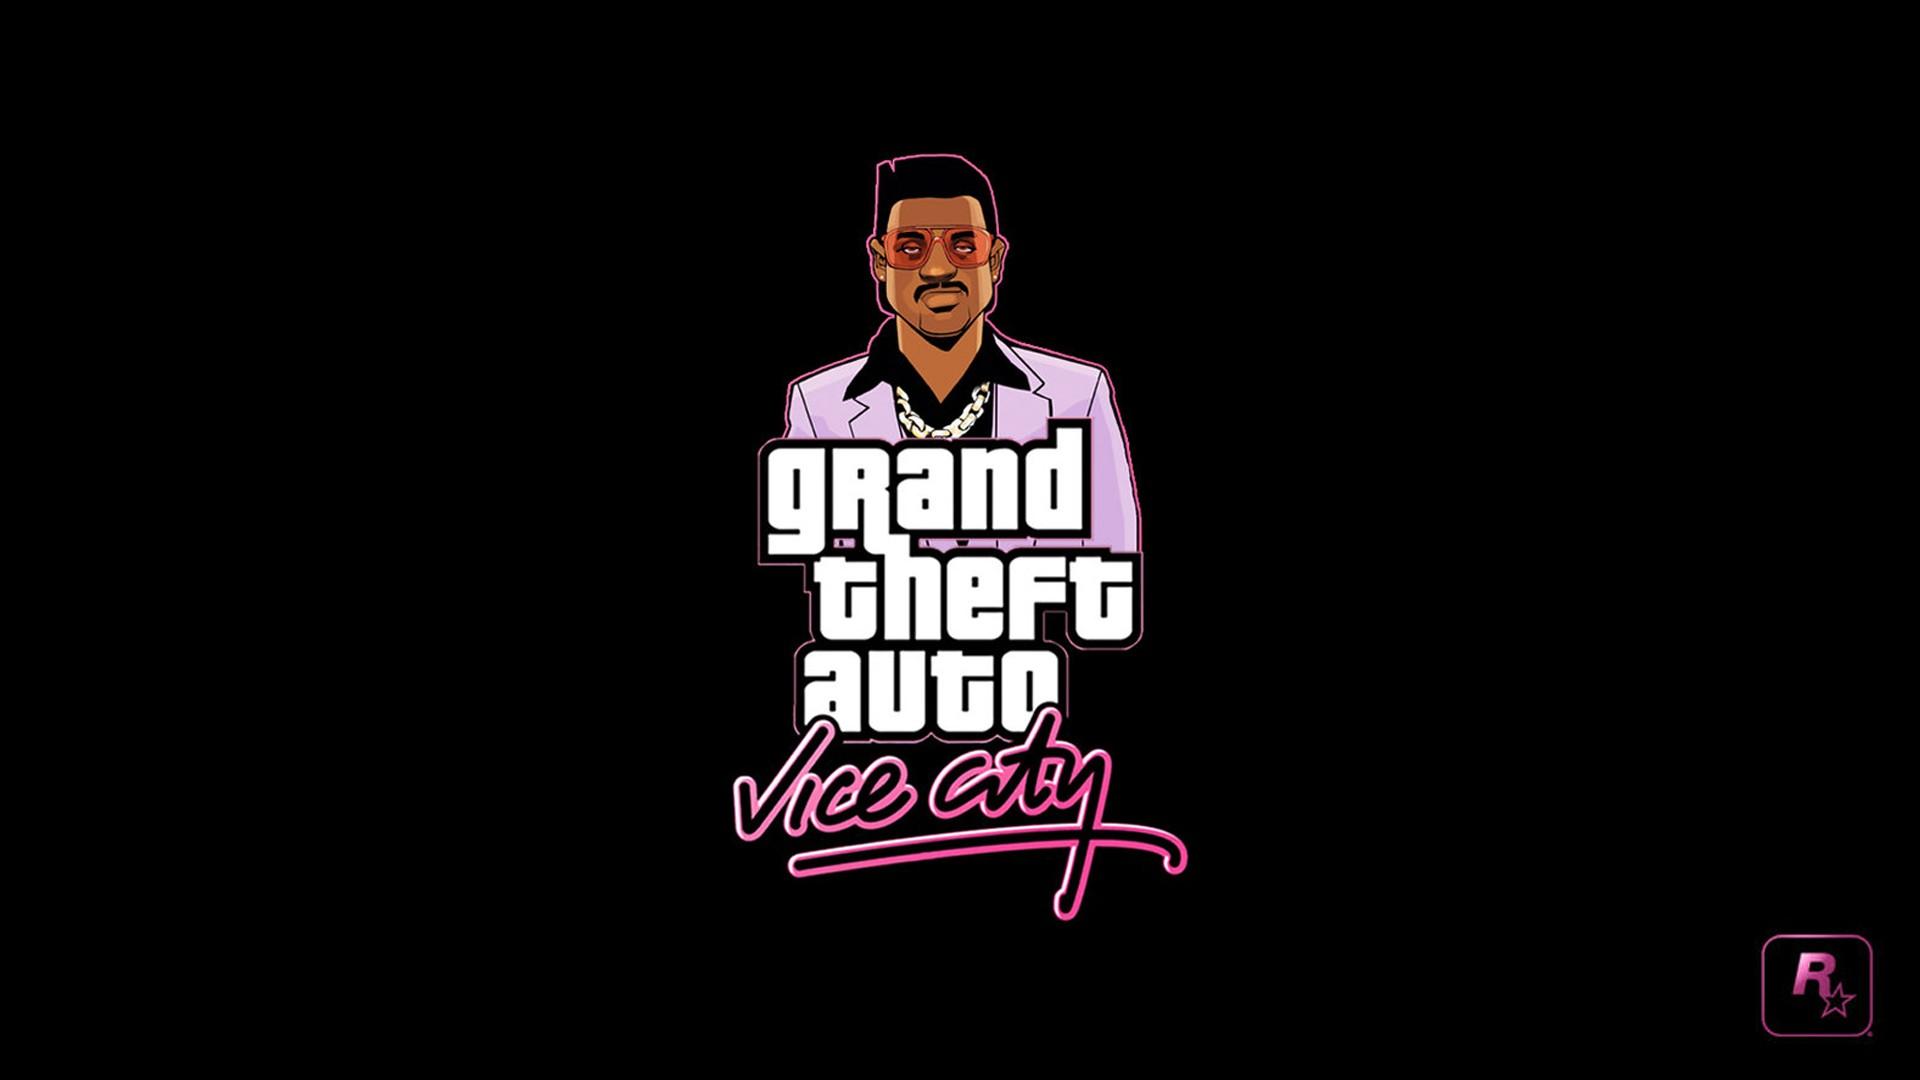 Fondos De Pantalla Videojuegos Grand Theft Auto Vice City